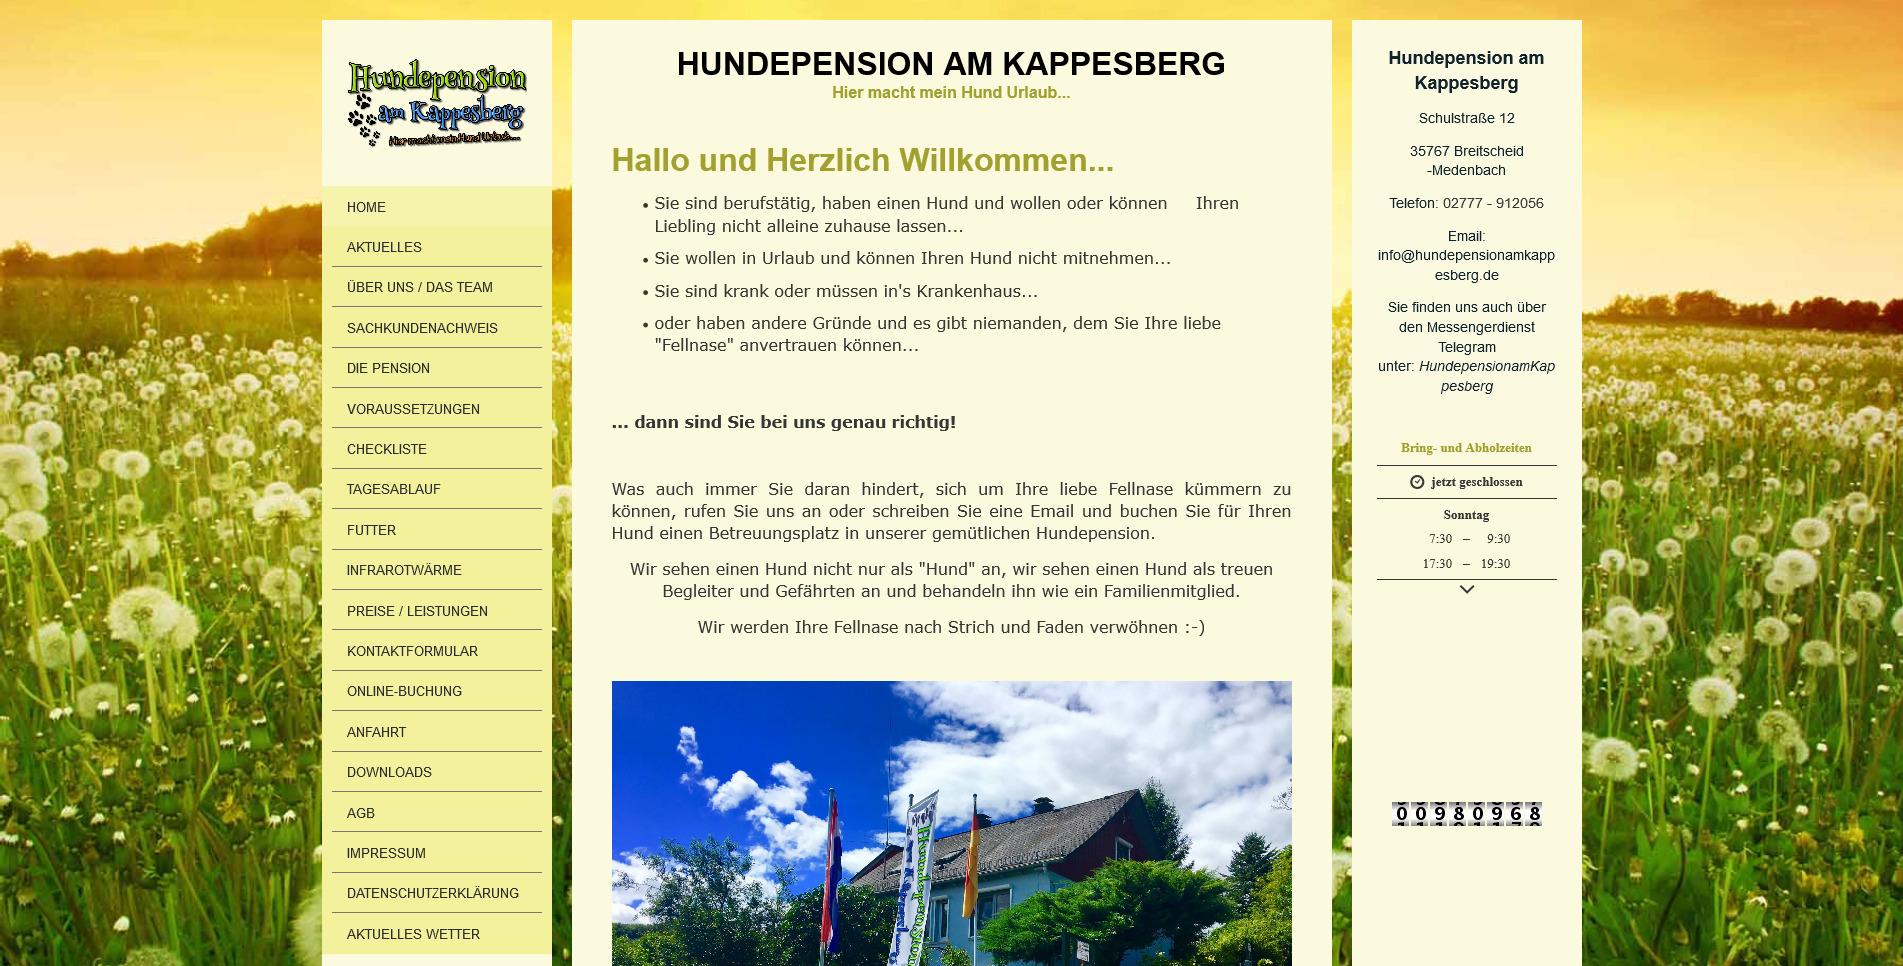 Hundepension am Kappesberg